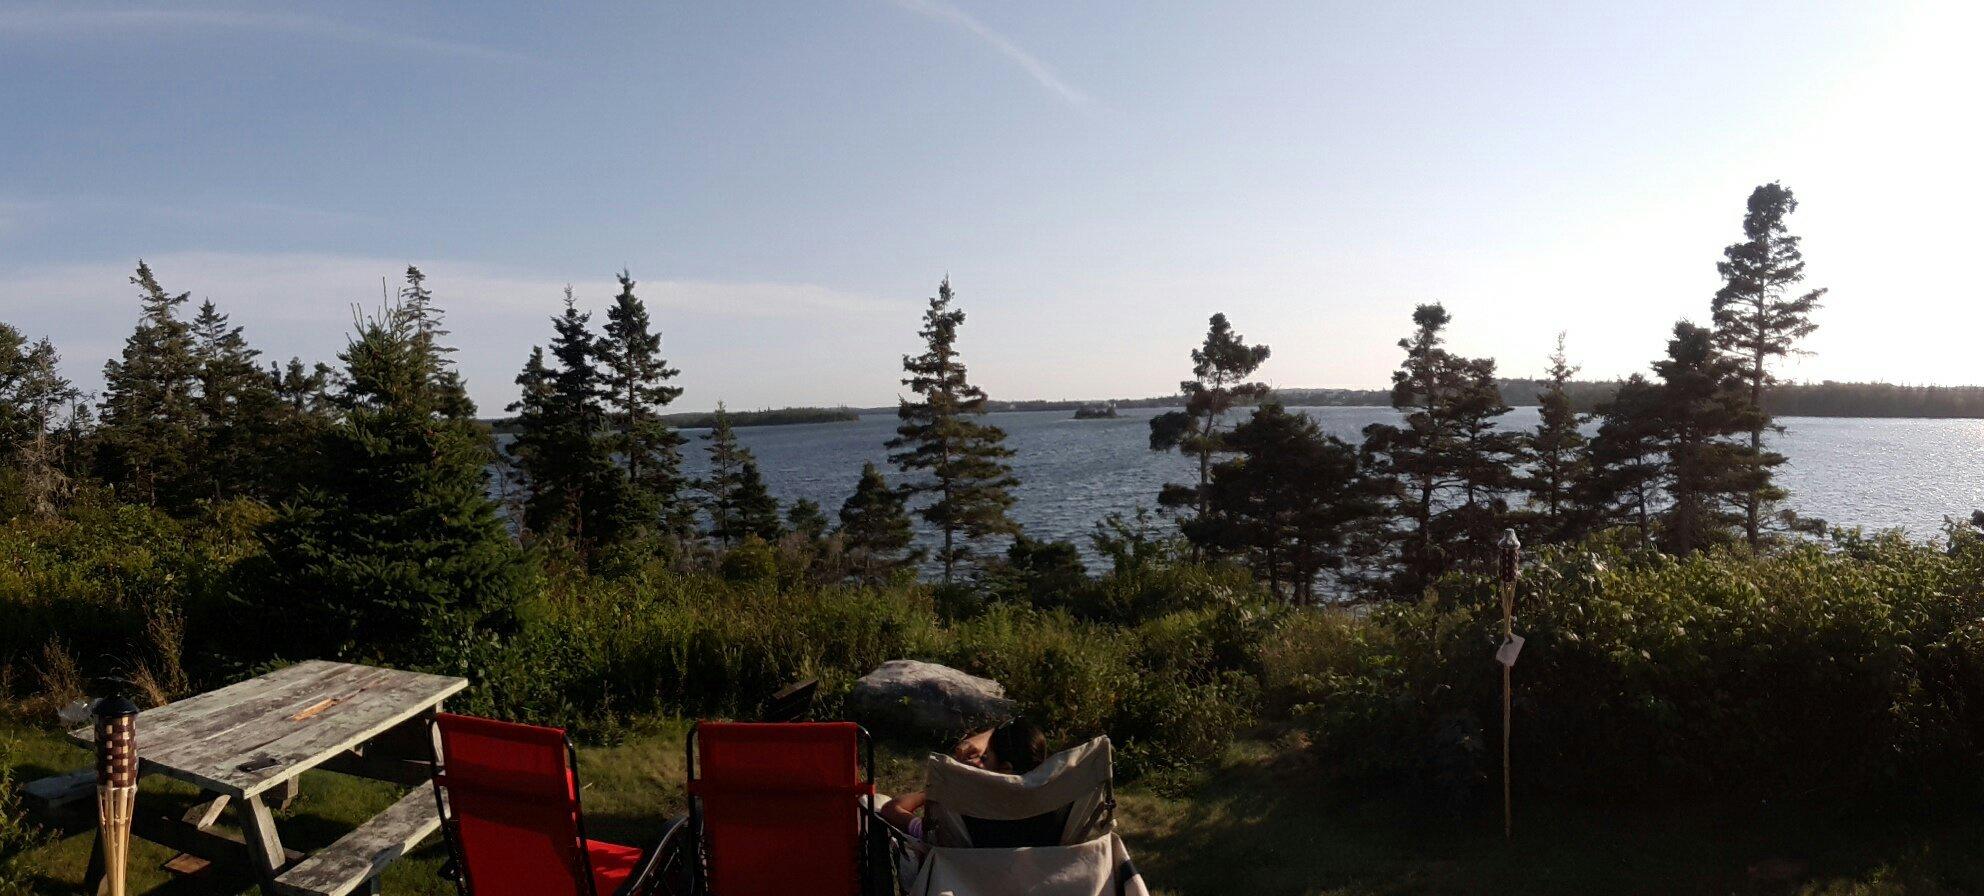 Porters Lake